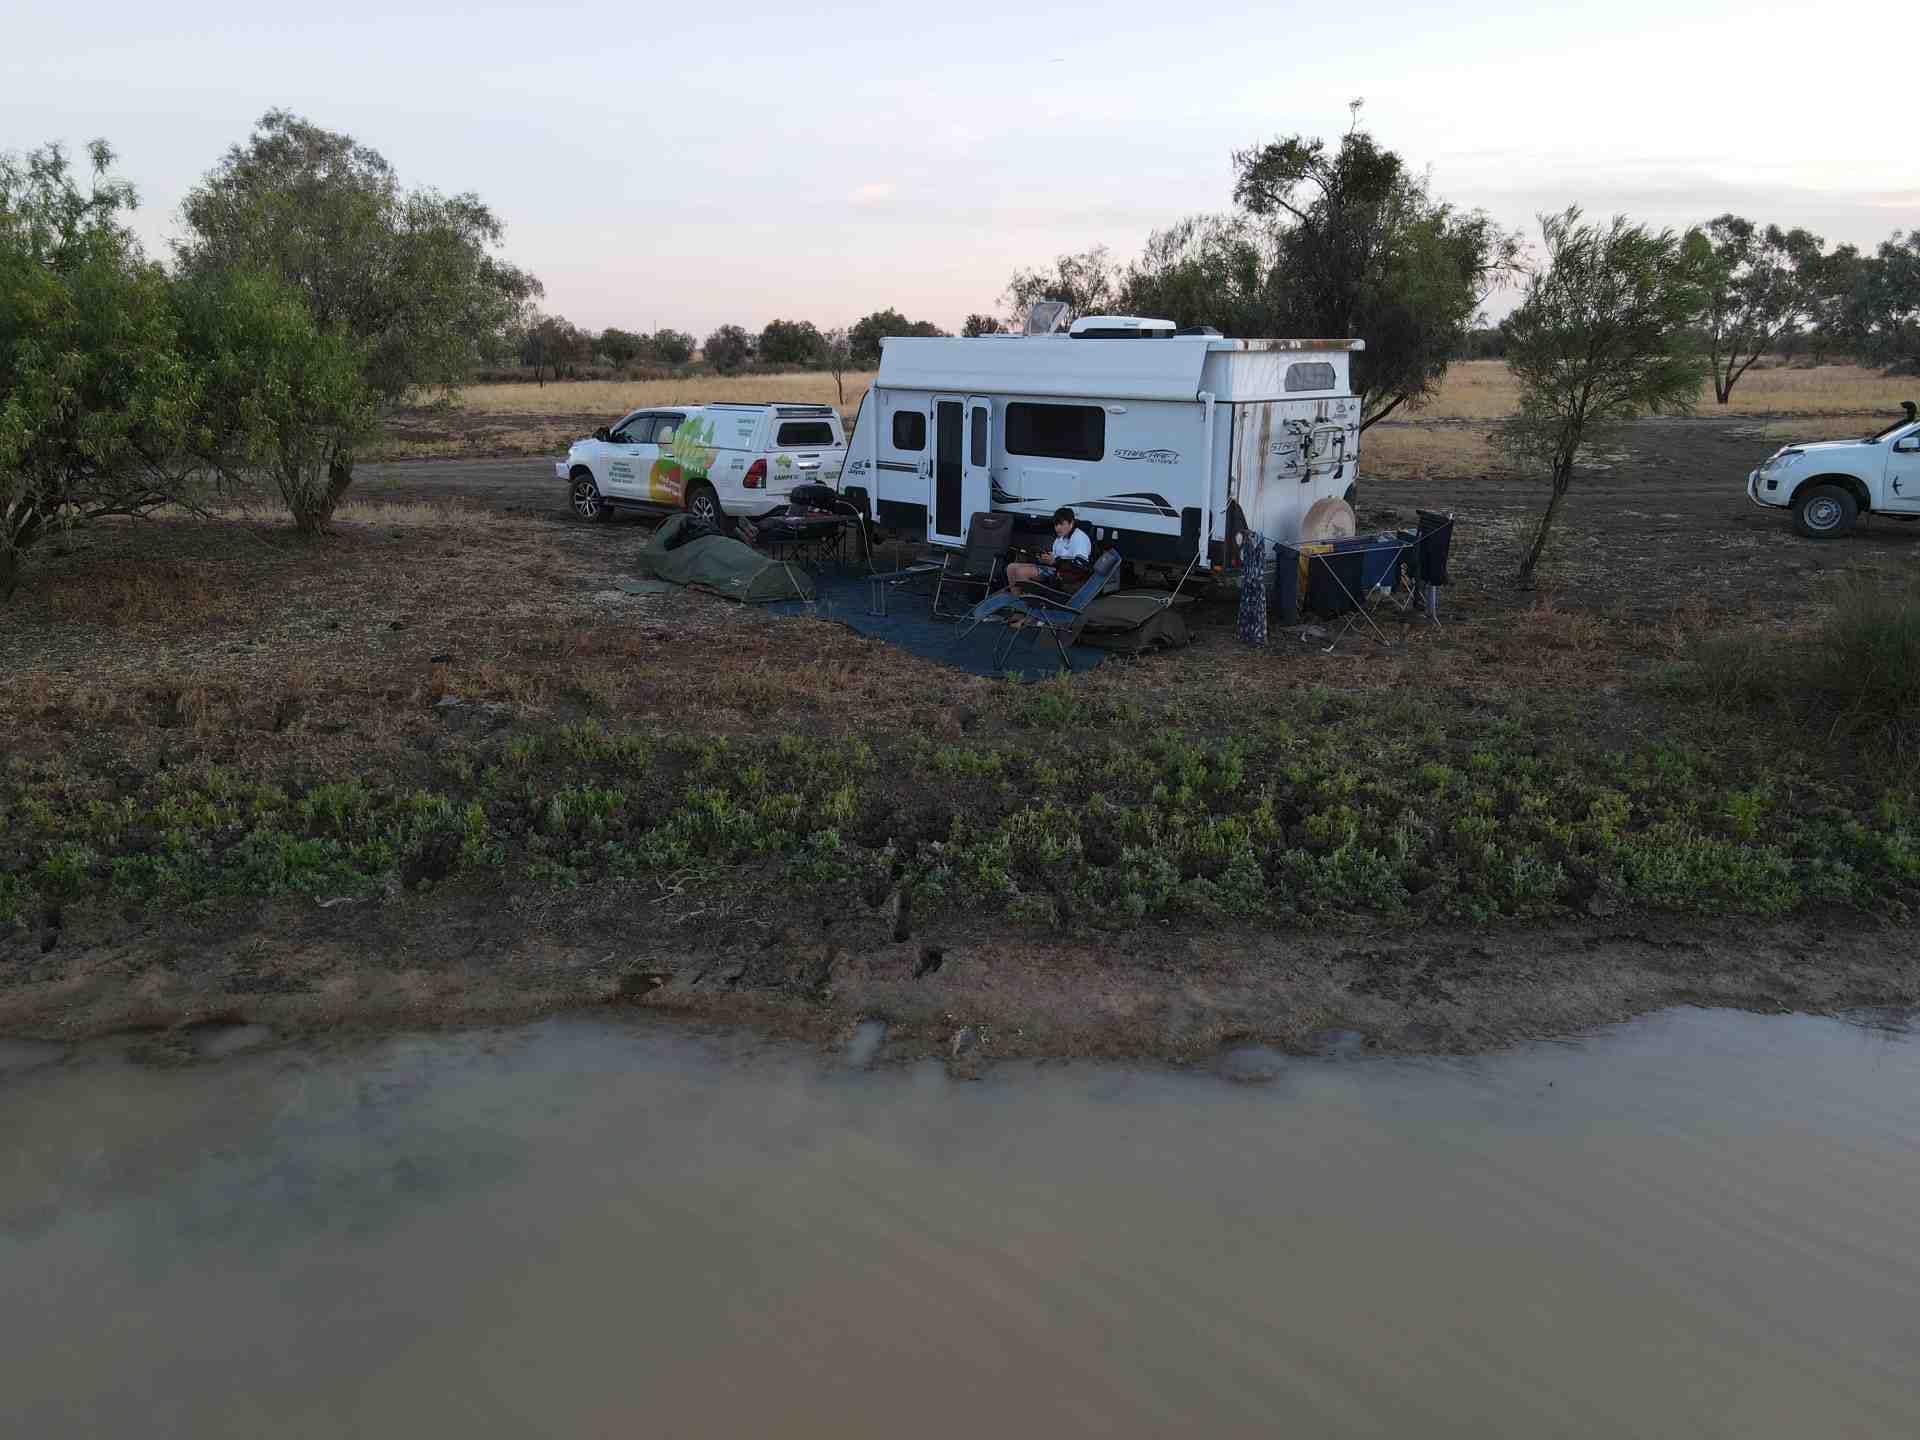 Camps Australia Wide stop at Winton - Long Waterhole image credit: Hugh Gilmore